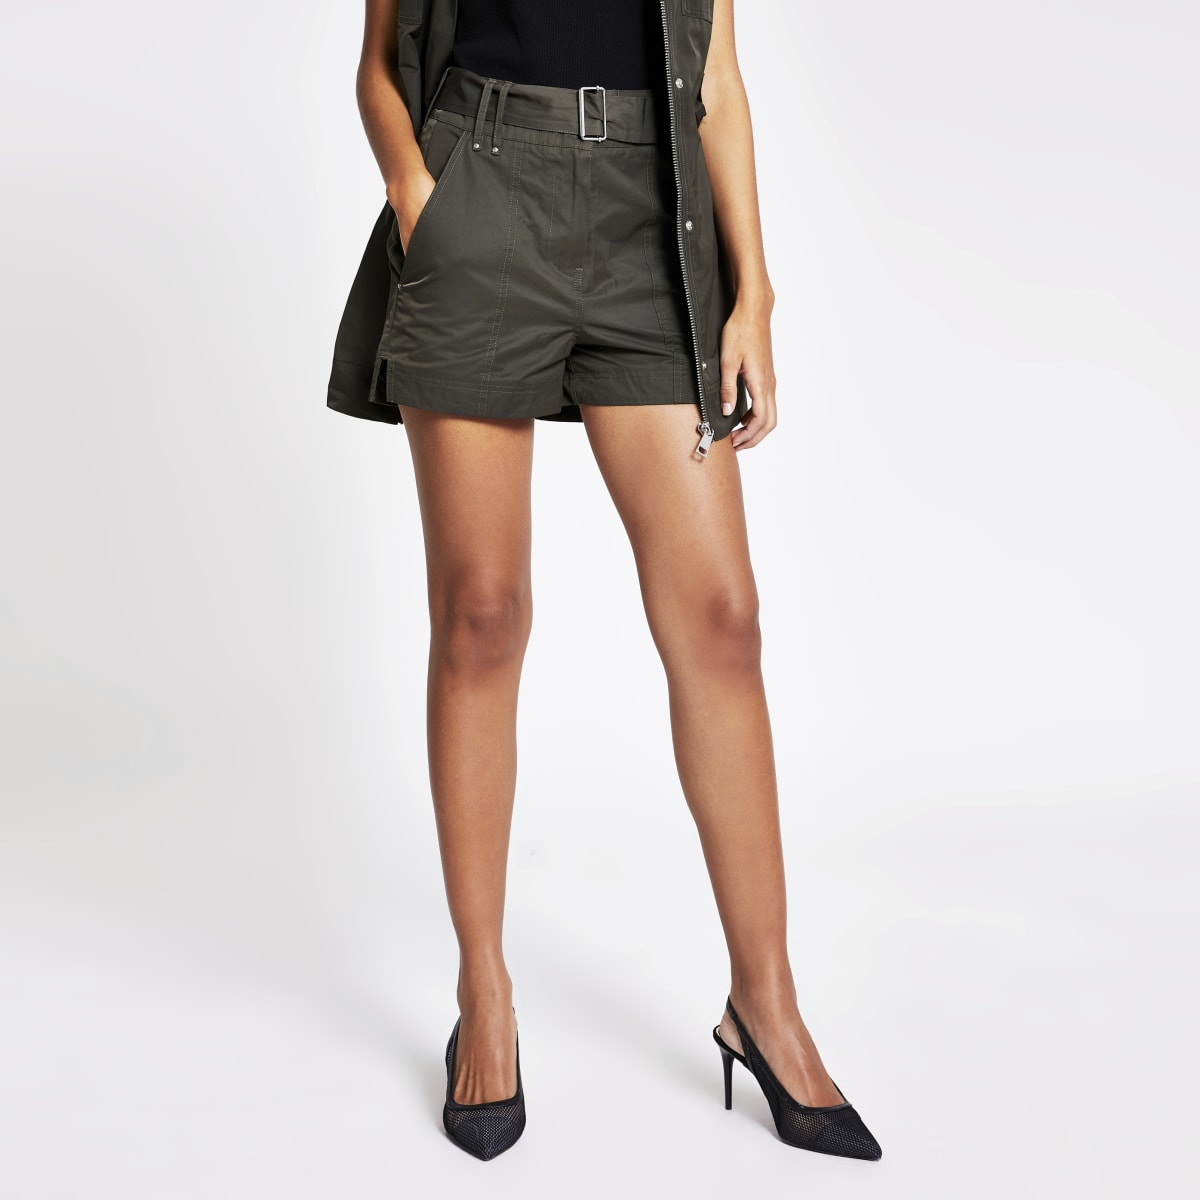 High-Rise-Shorts in Khaki mit Gürtel